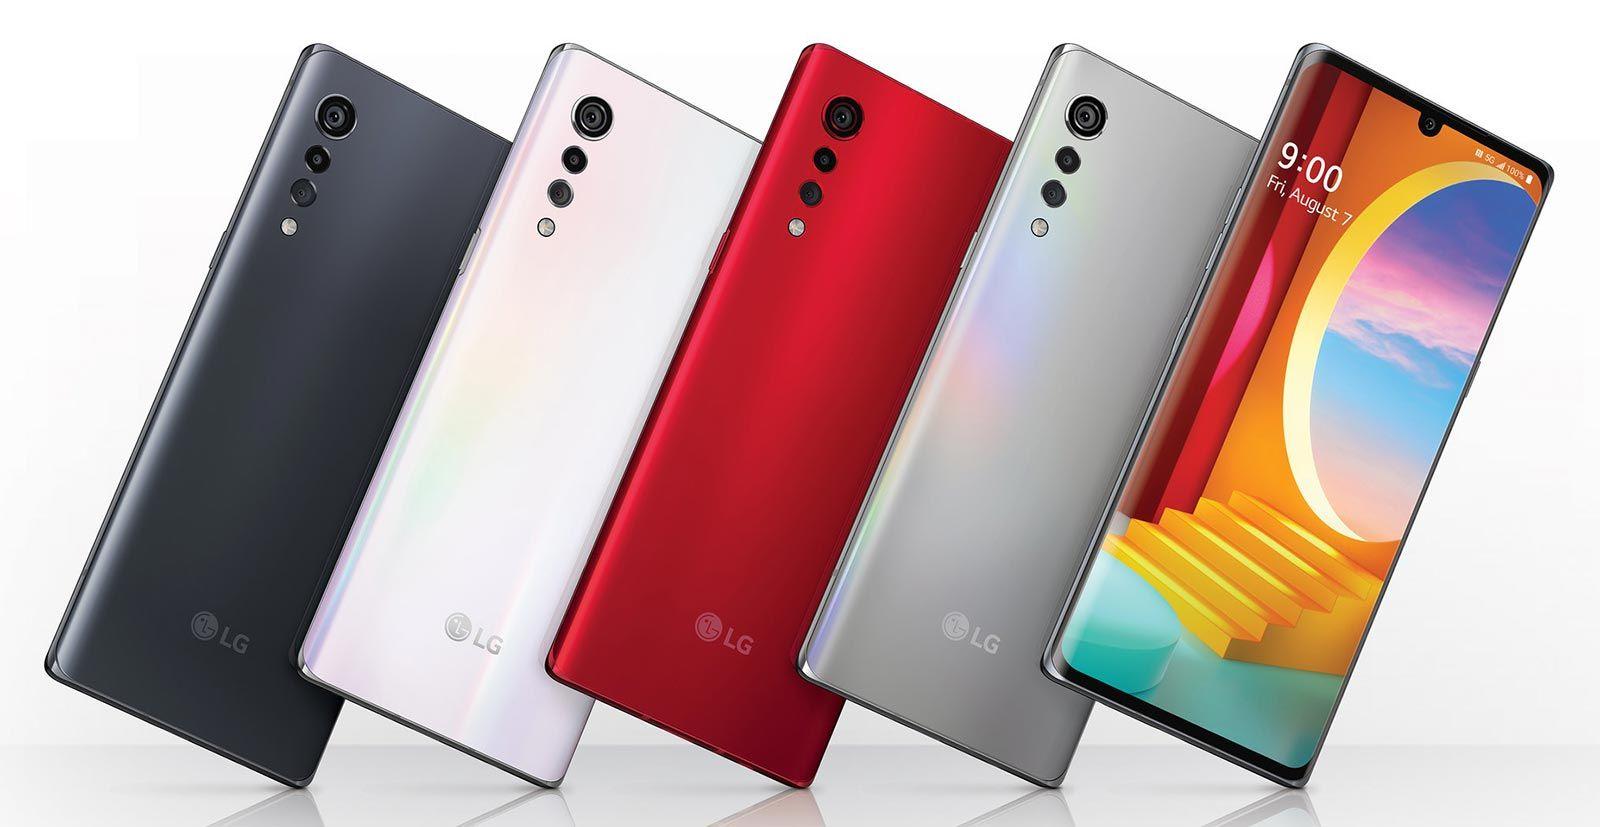 LG VELVET 2 Proは日本市場向けが存在したが断念、もうひとつの日本と中国市場向け機種の開発も断念